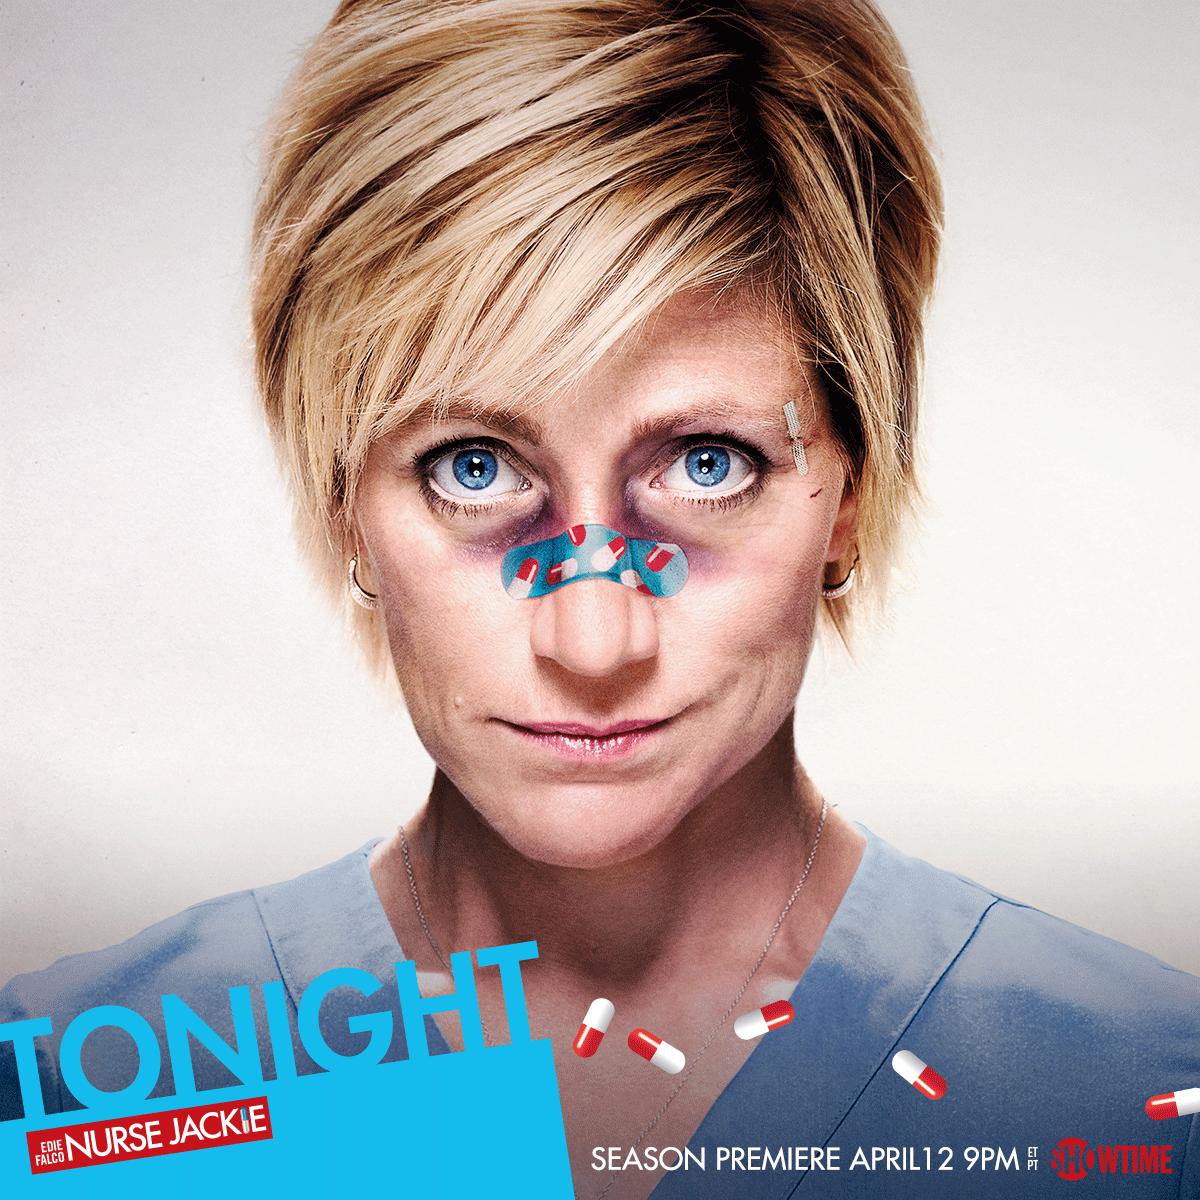 Never go down easy. #NurseJackie returns TONIGHT at 9PM ET/PT. http://t.co/KmO8y7jPbV